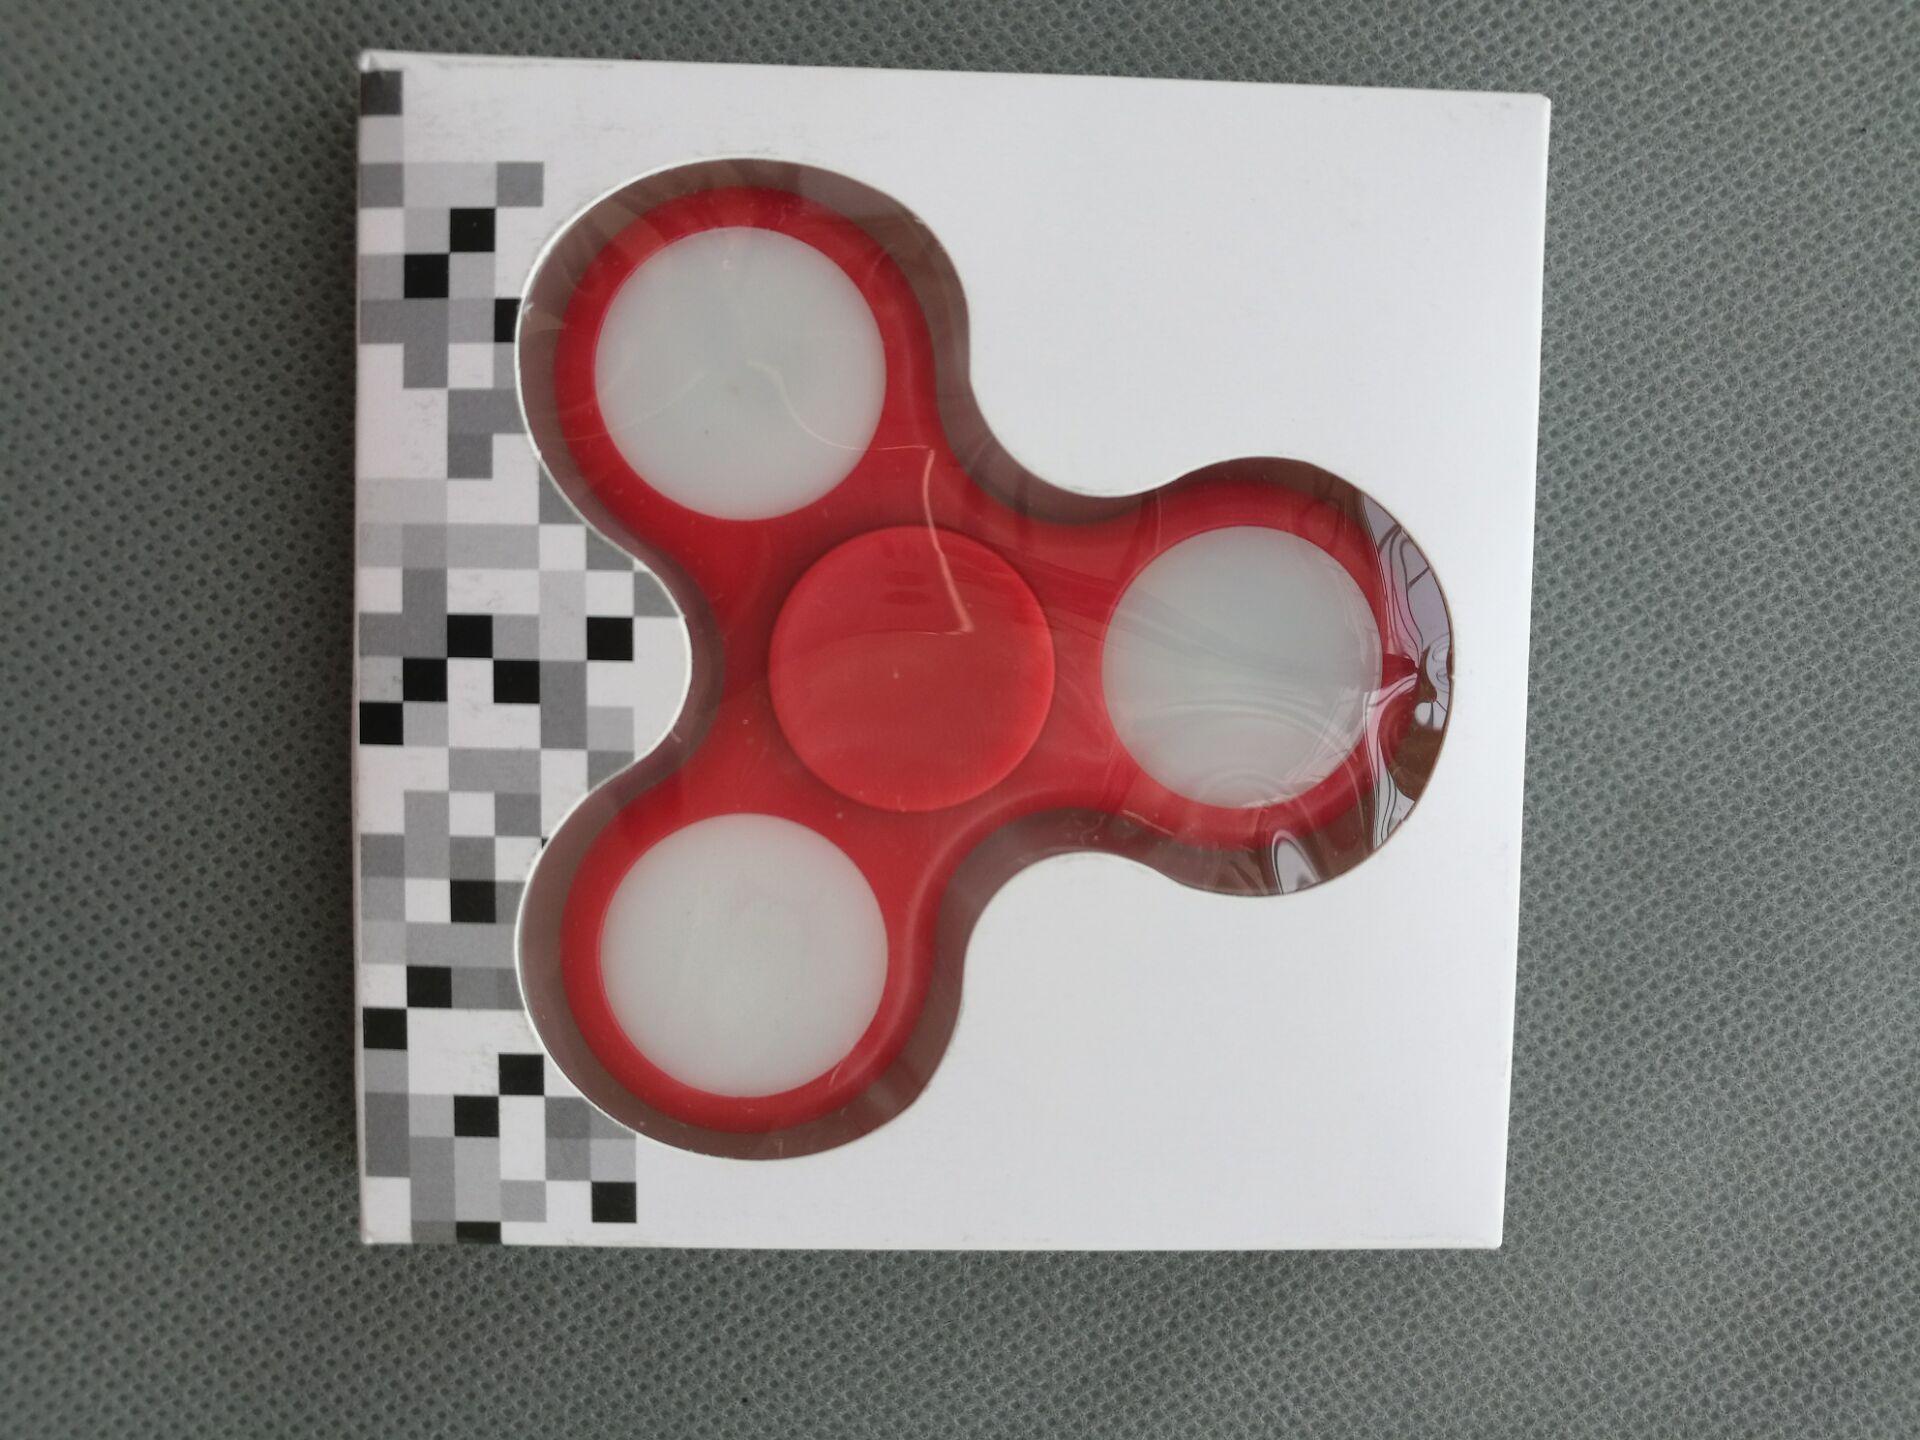 Продам 10шт LED Light Hand Finger Spinner Fidget пластик EDC Hand Spinner для аутизма и СДВГ рельеф фокус Тревога стресс игрушки подарок #E